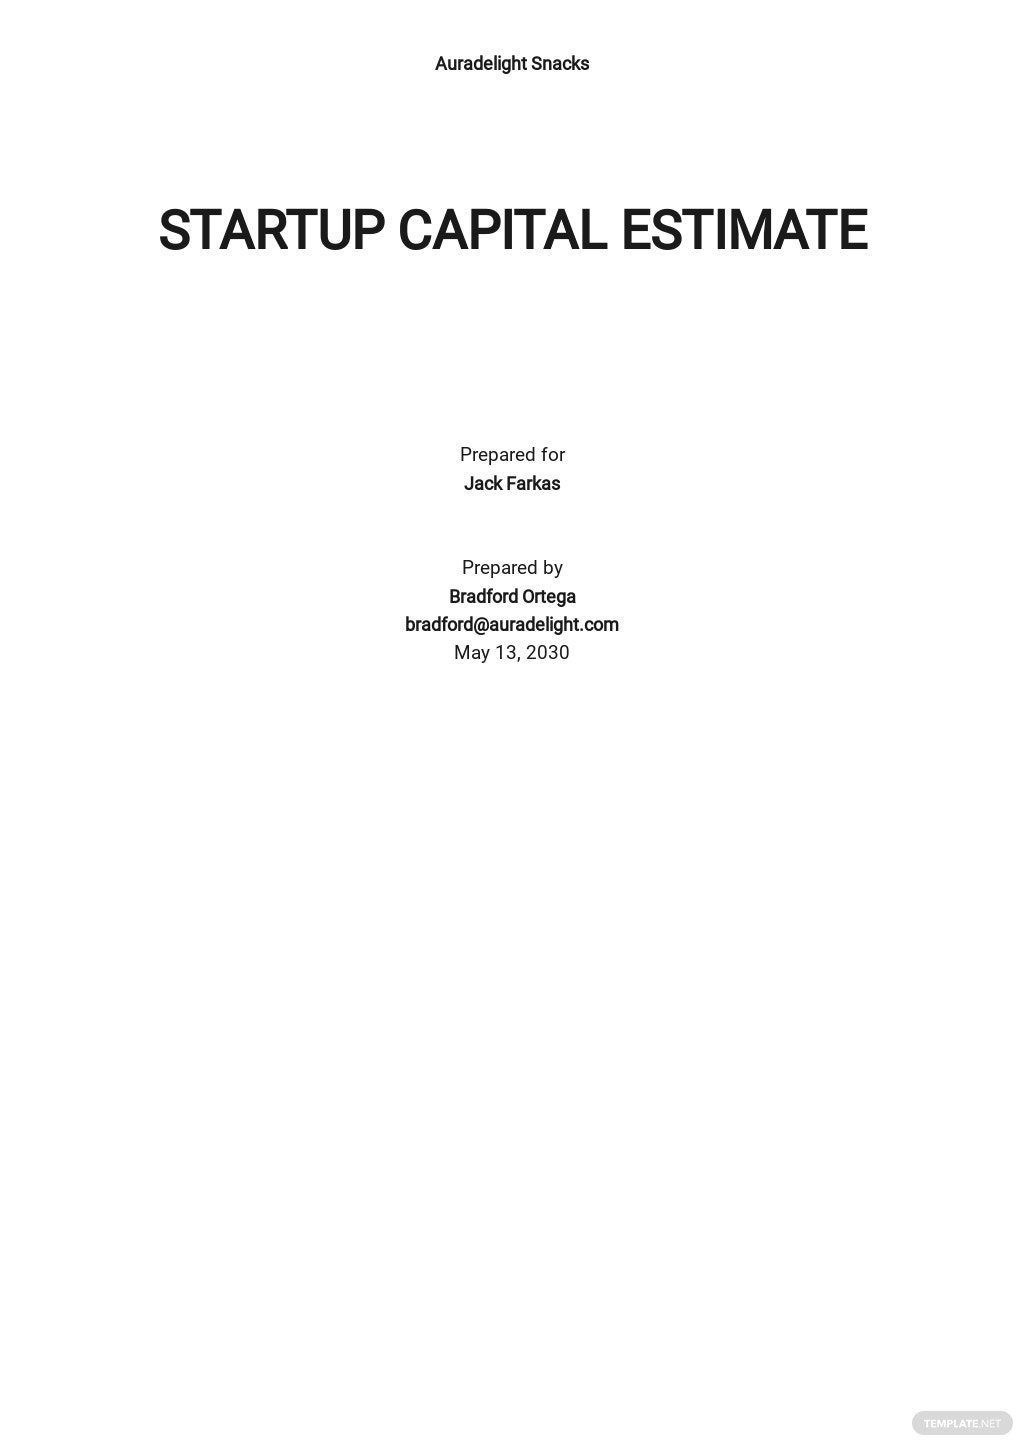 Blank Startup Capital Estimate Template